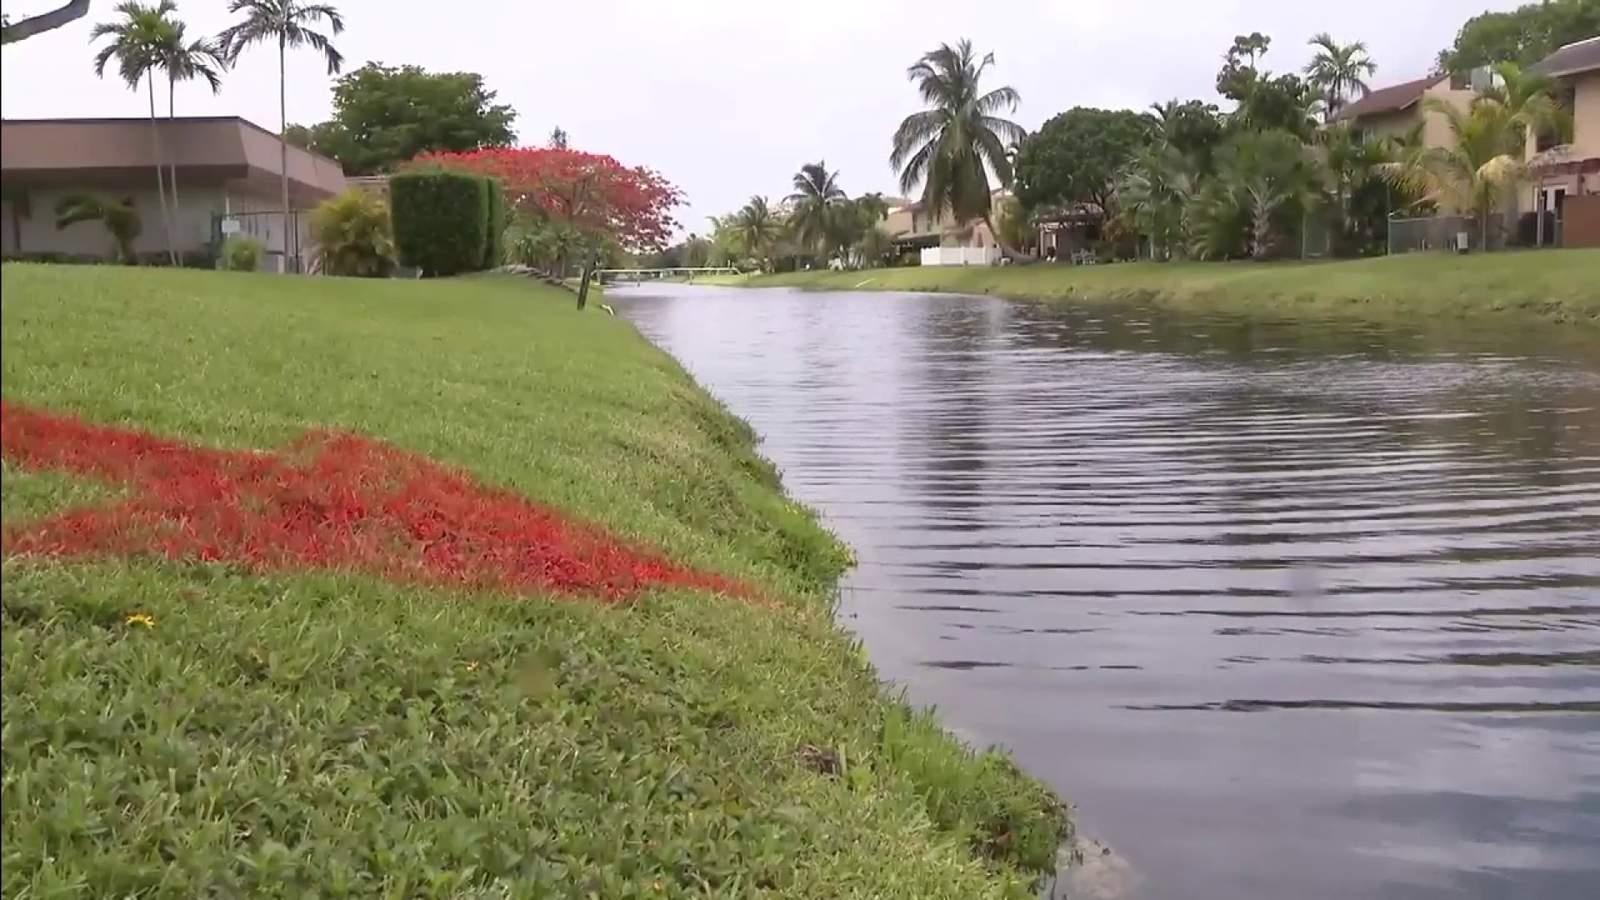 Miami-Dade medical examiner confirms Alejandro Ripley, 9, drowned in canal